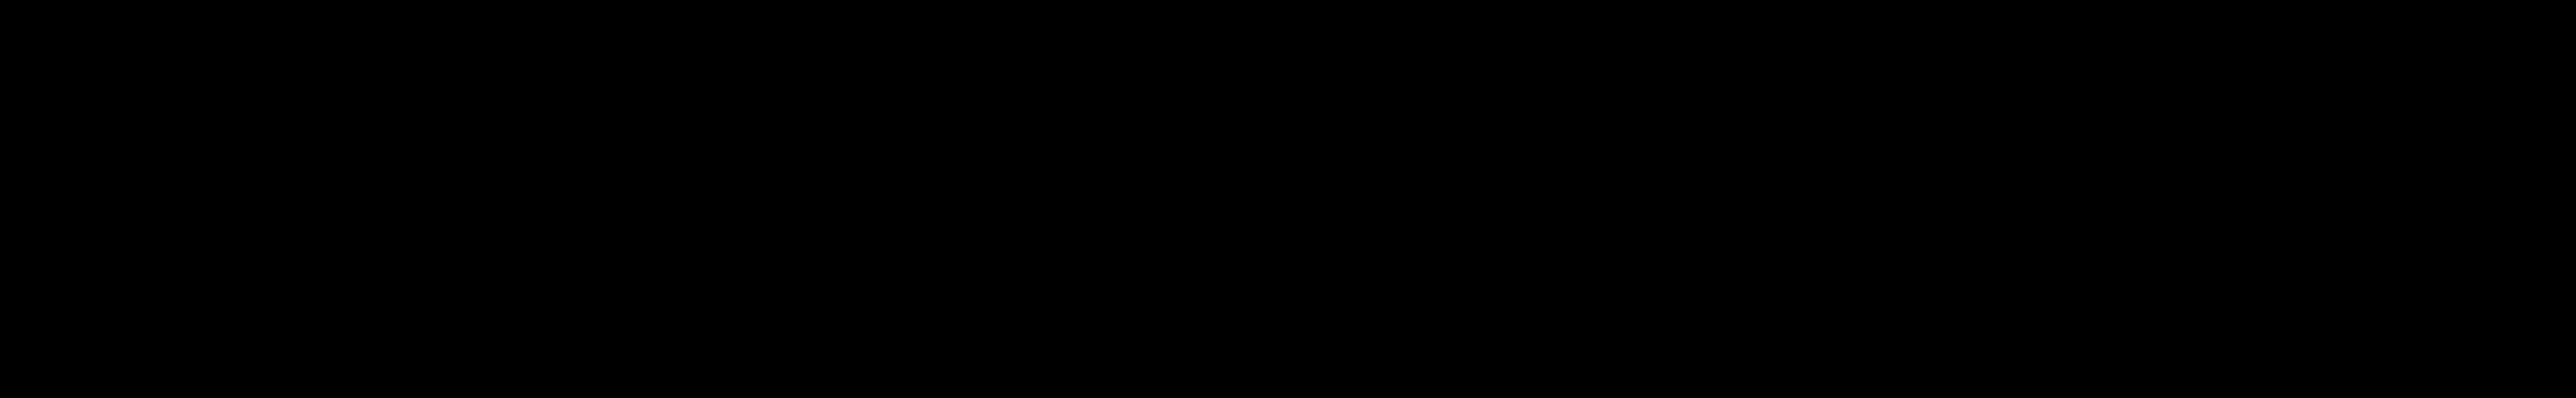 PrincipePio